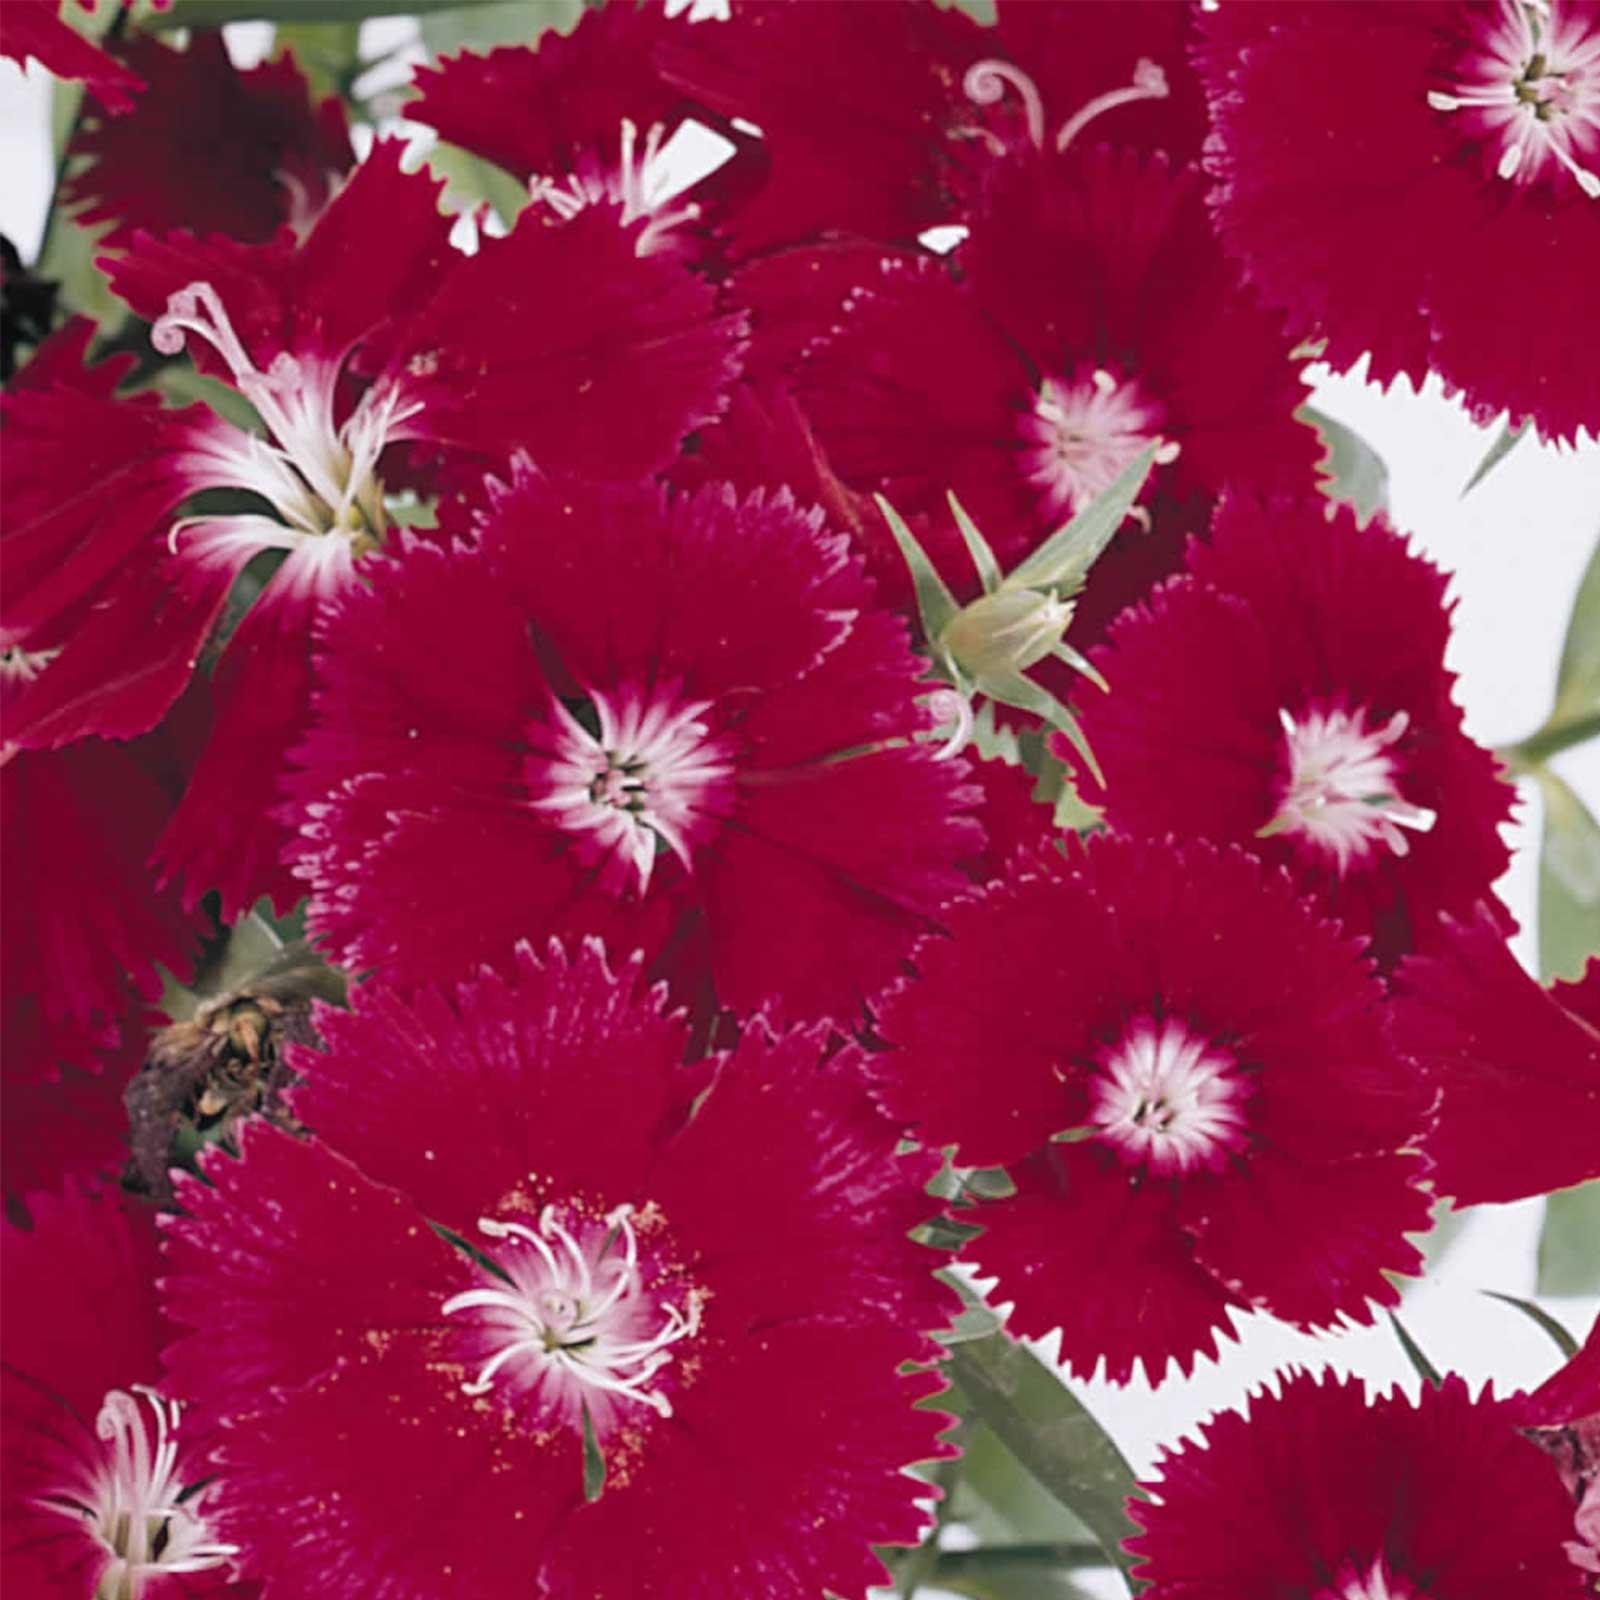 Dianthus Floral Lace Series Flower Seeds Crimson 500 Seeds